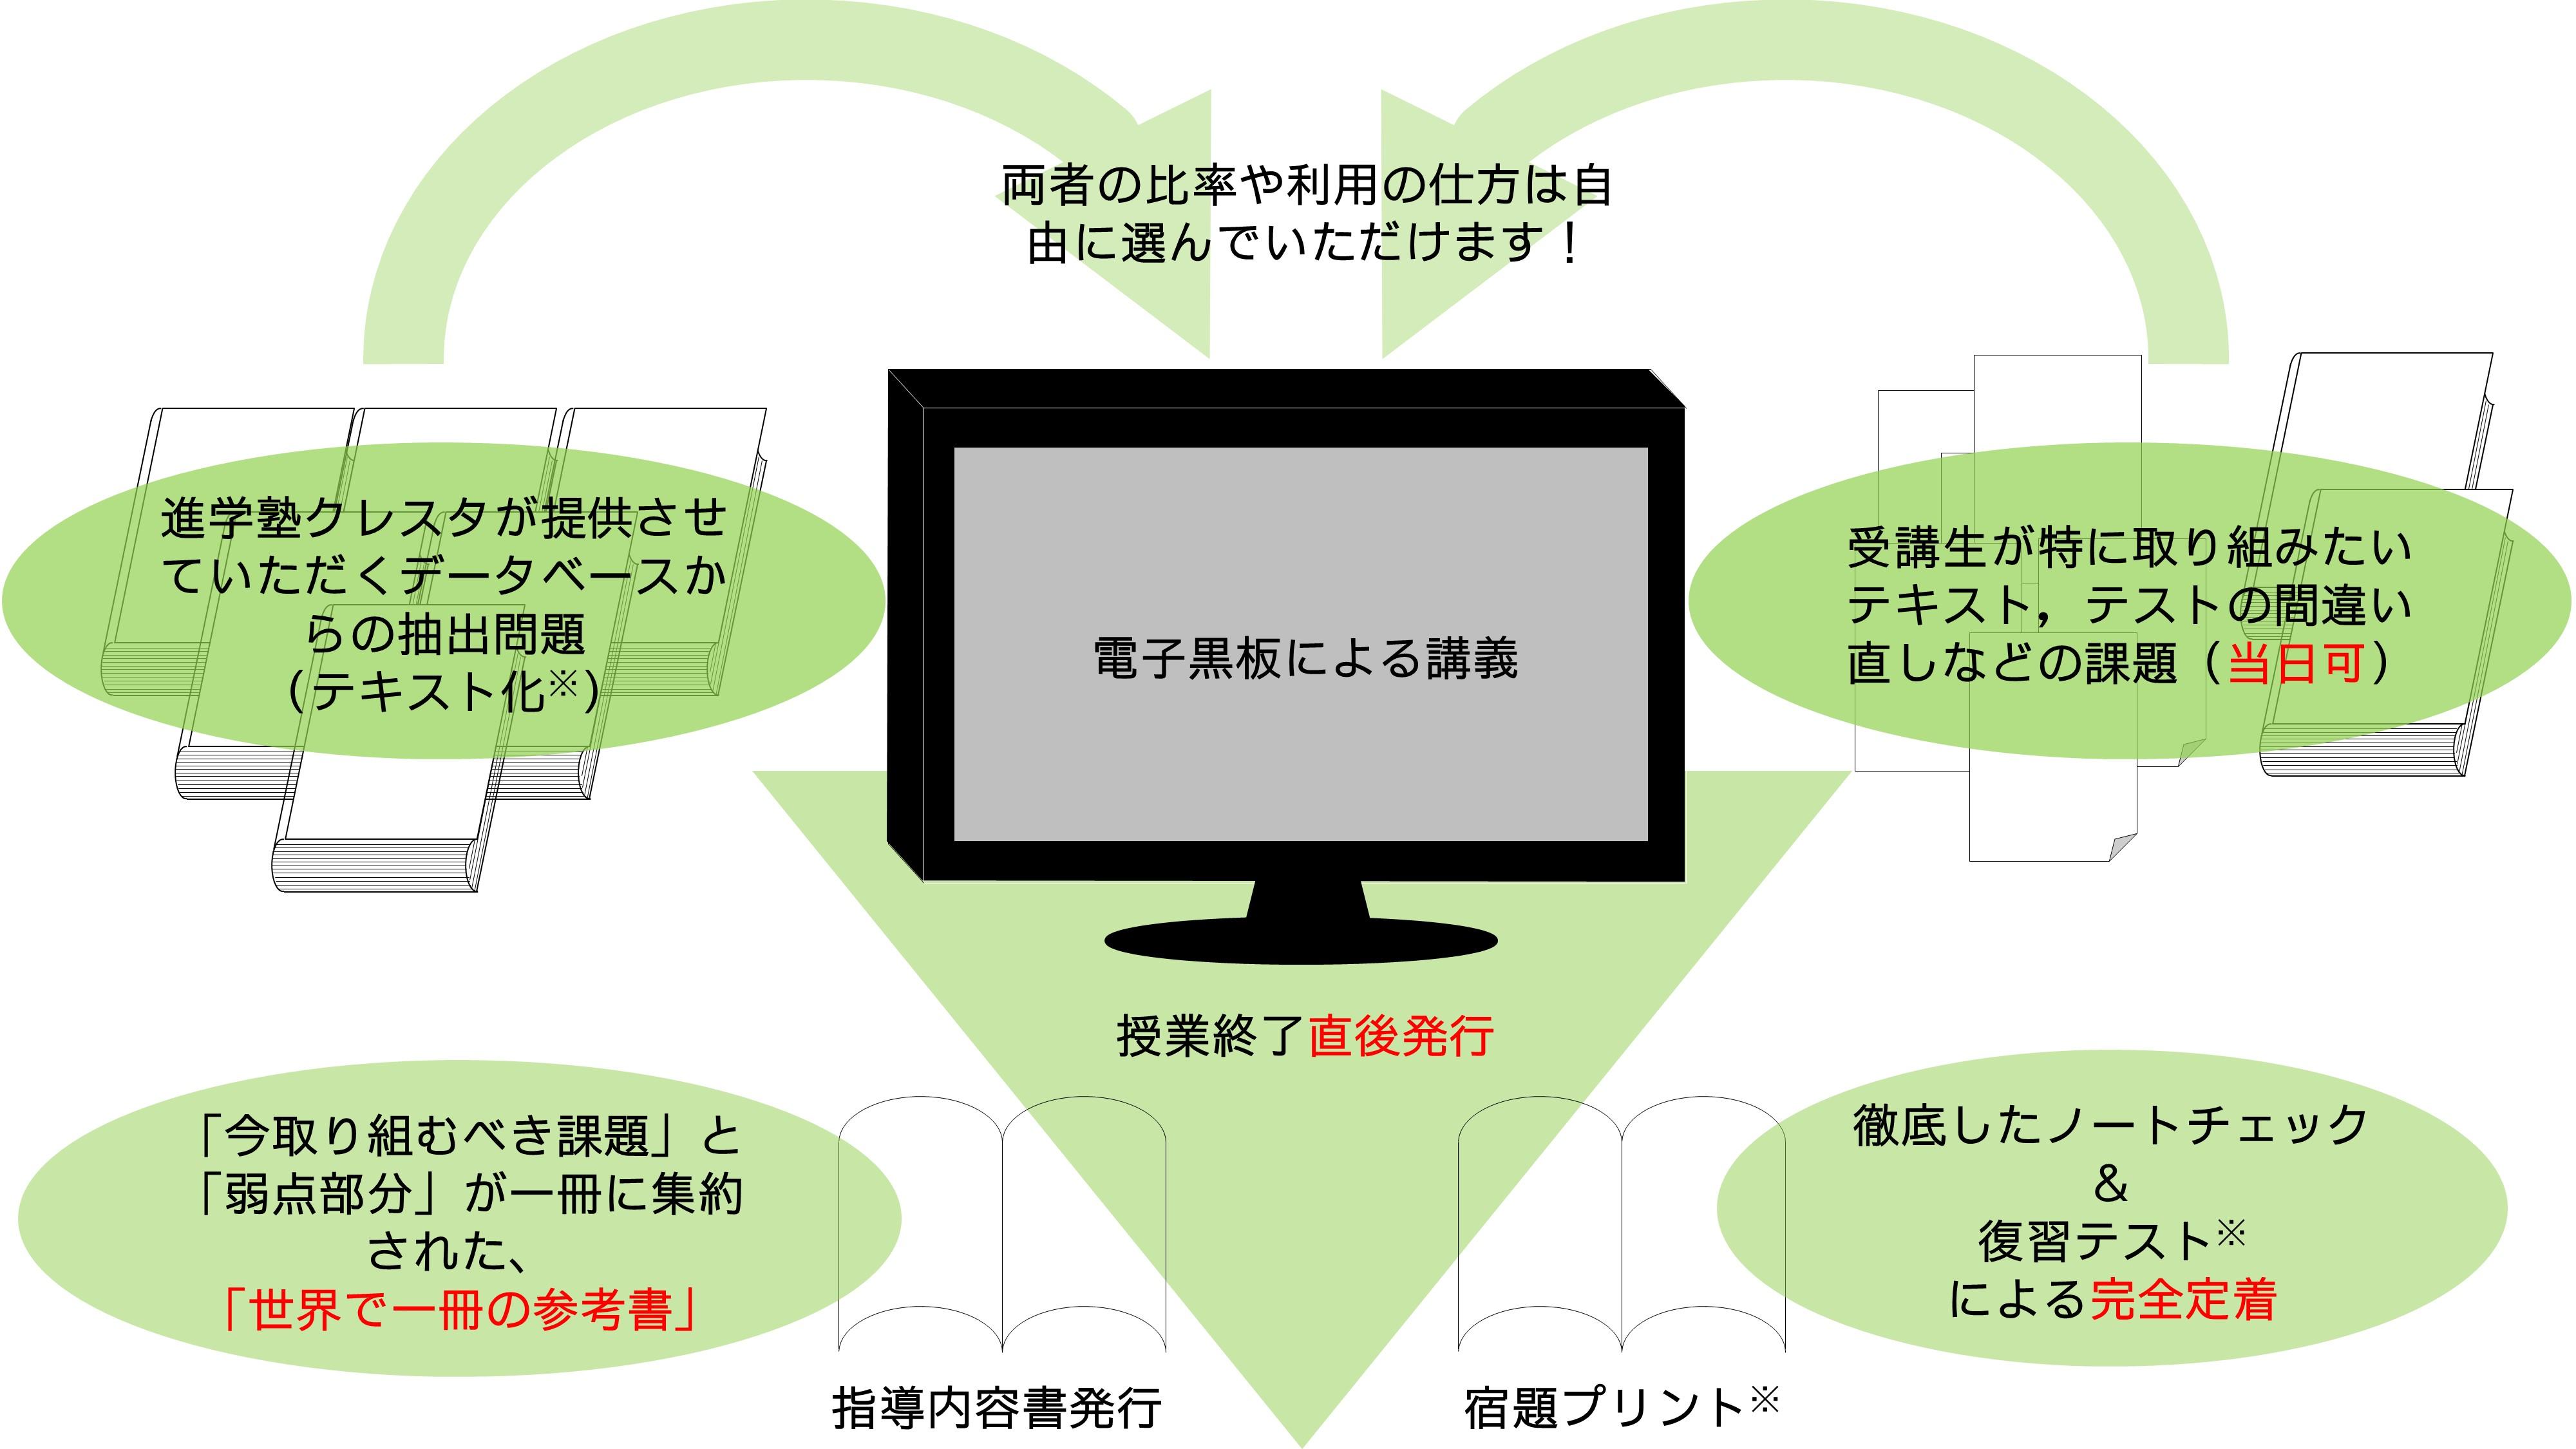 16kobetsu_flowchart